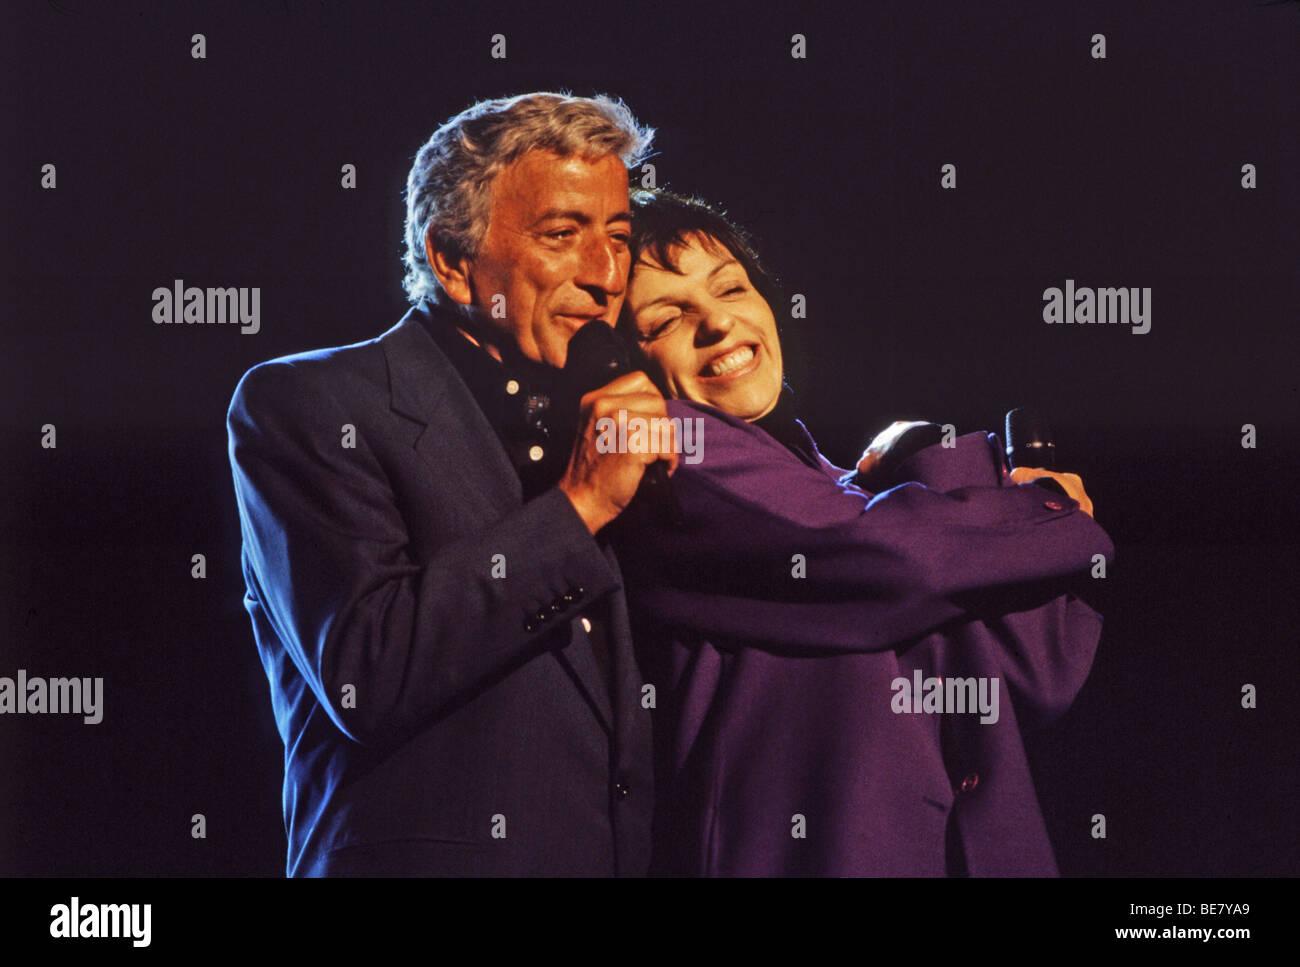 TONY BENNETT duets with Liza Miinnelli - Stock Image